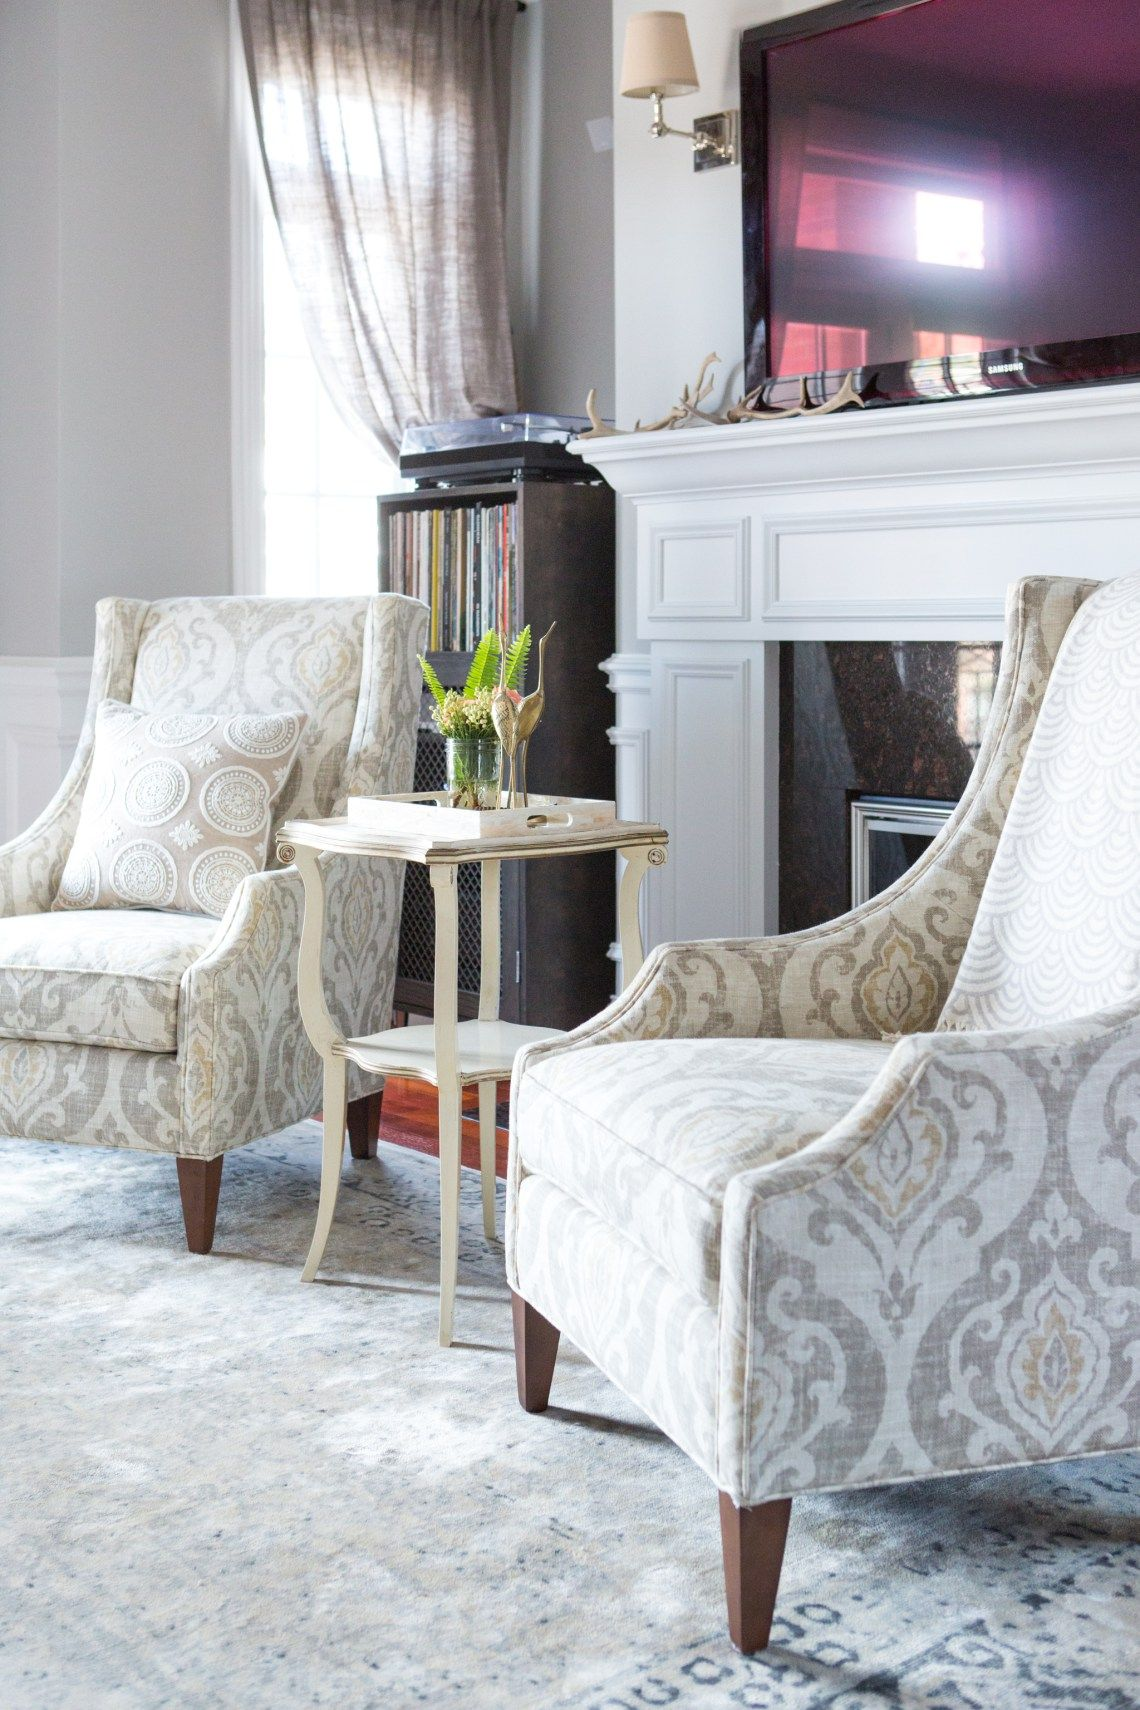 Designer Tips For Mixing Interior Styles Francois Et Moi Living Room Grey Living Room Shades Tan Living Room #teal #and #tan #living #room